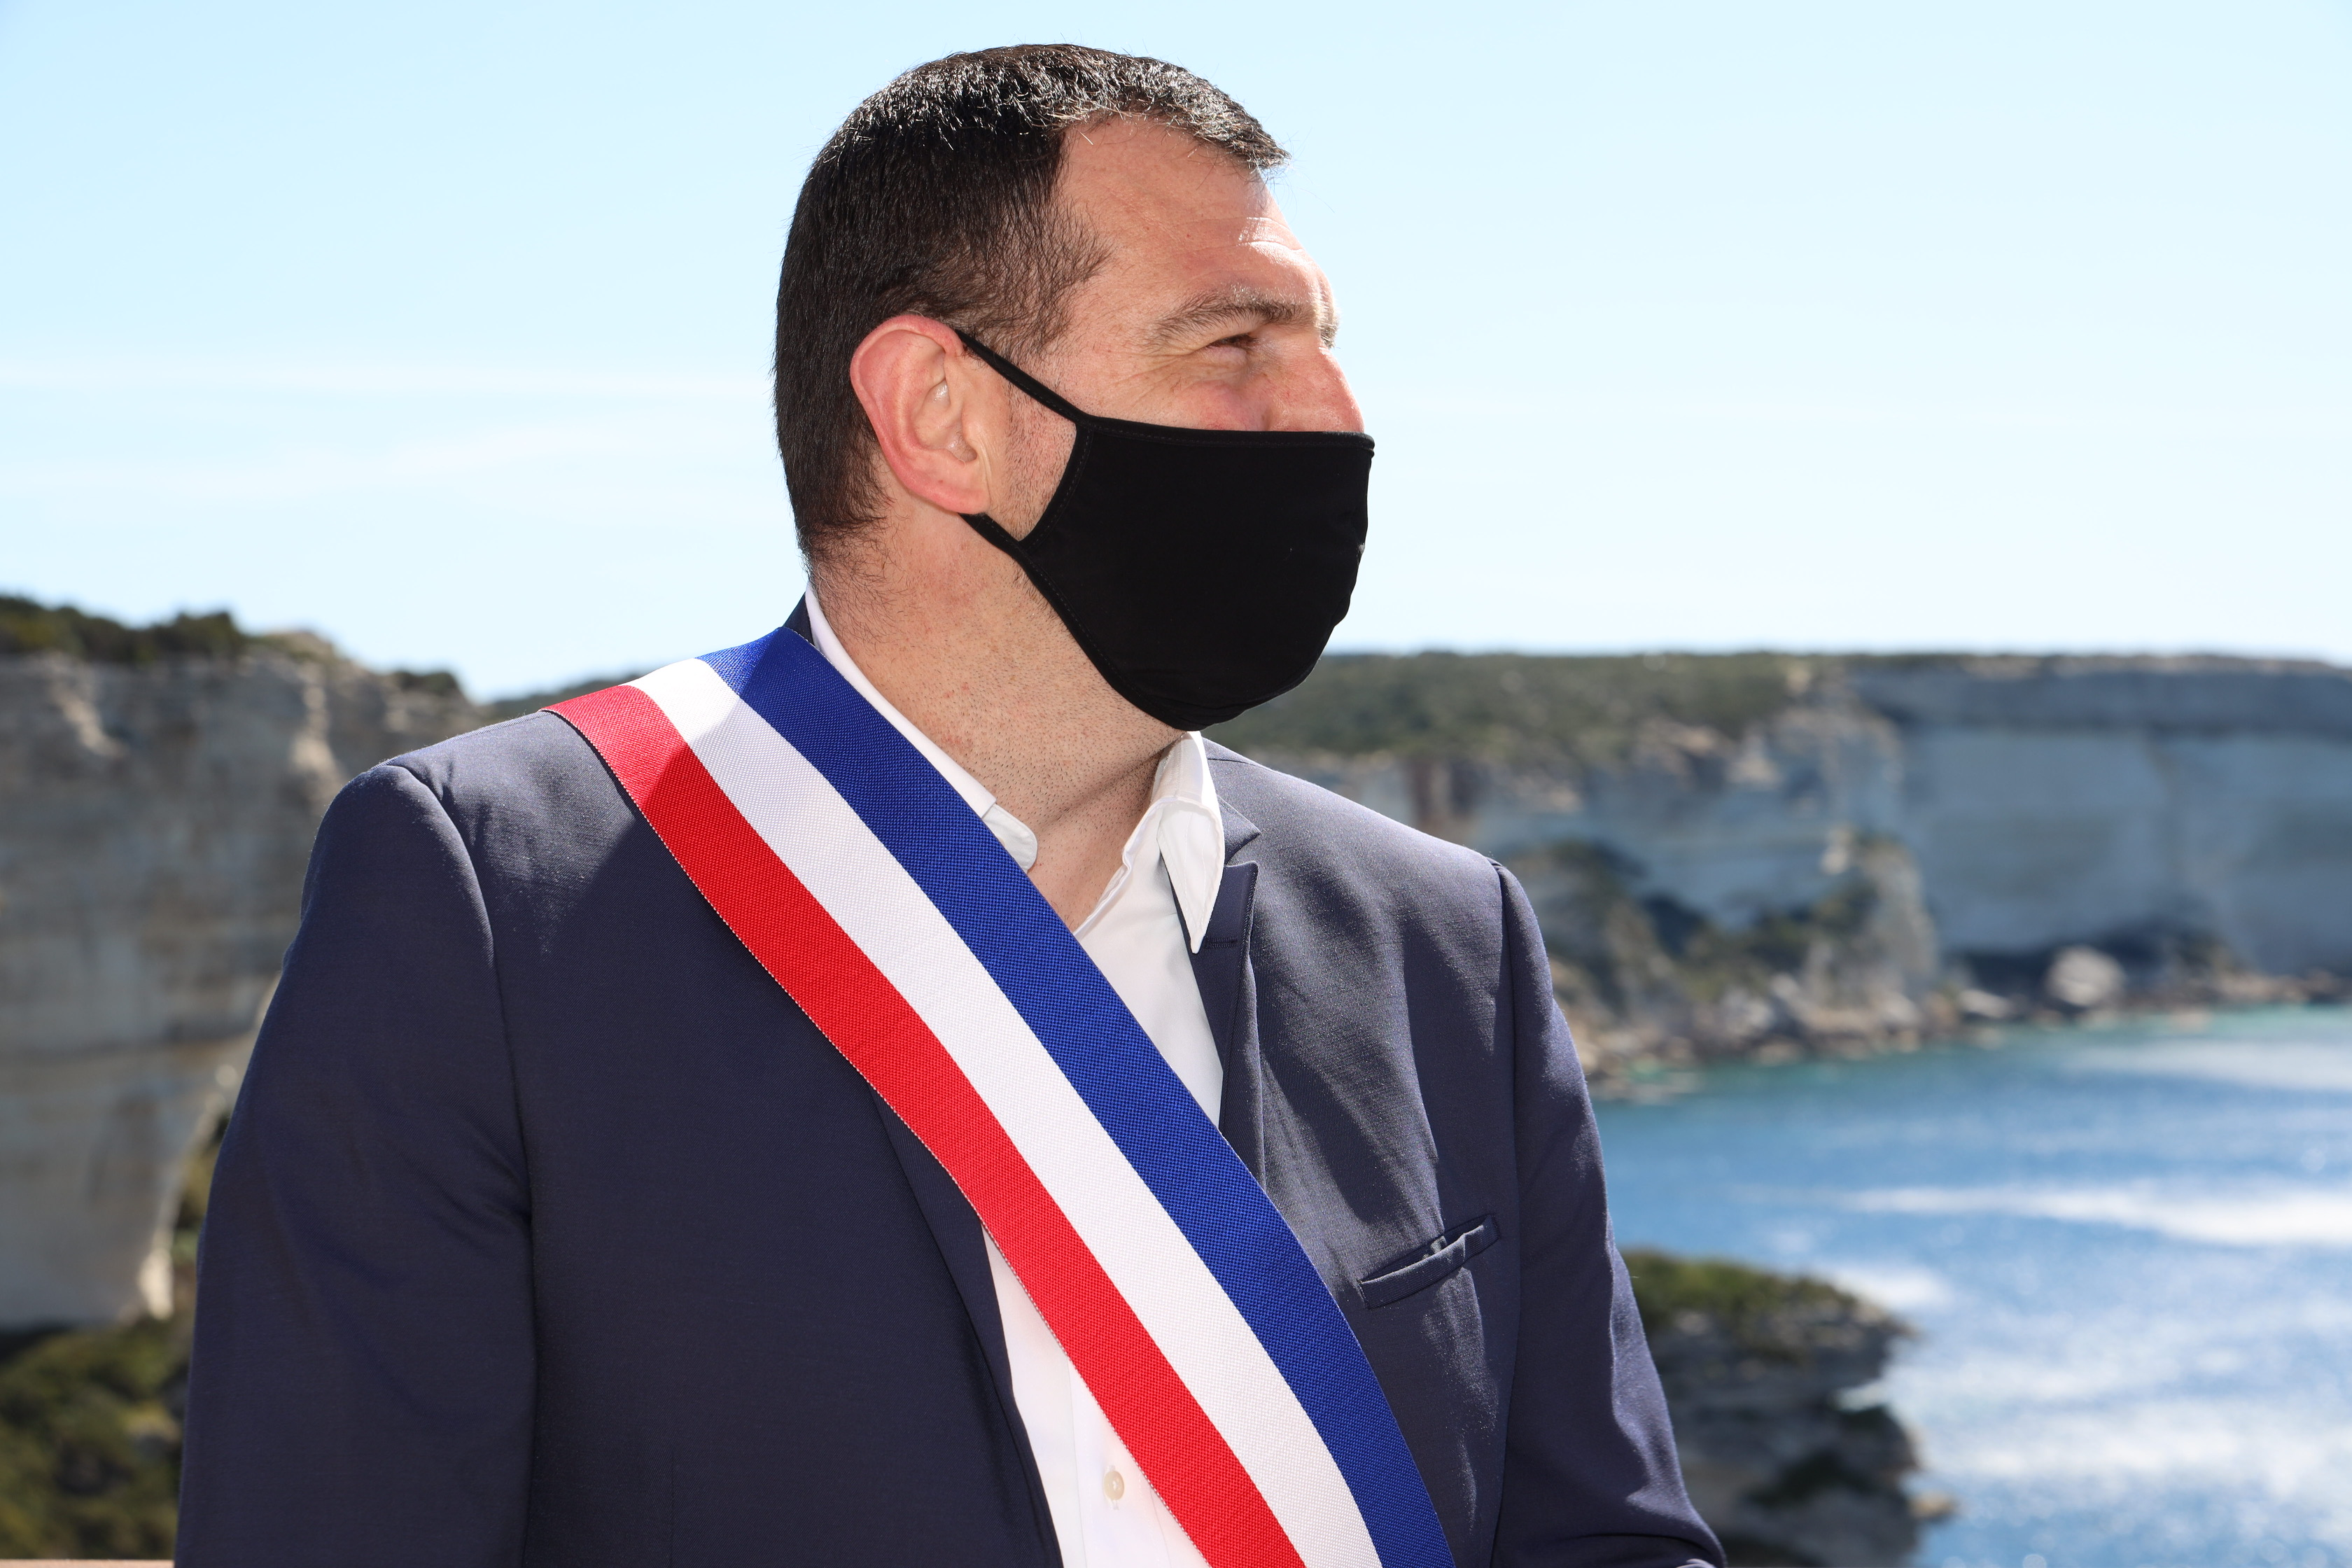 Le maire de Bonifacio Jean-Charles Orsucci lors de la visite de la ministre Marlène Schiappa ce vendredi 9 avril. Photo : Laurent Roch